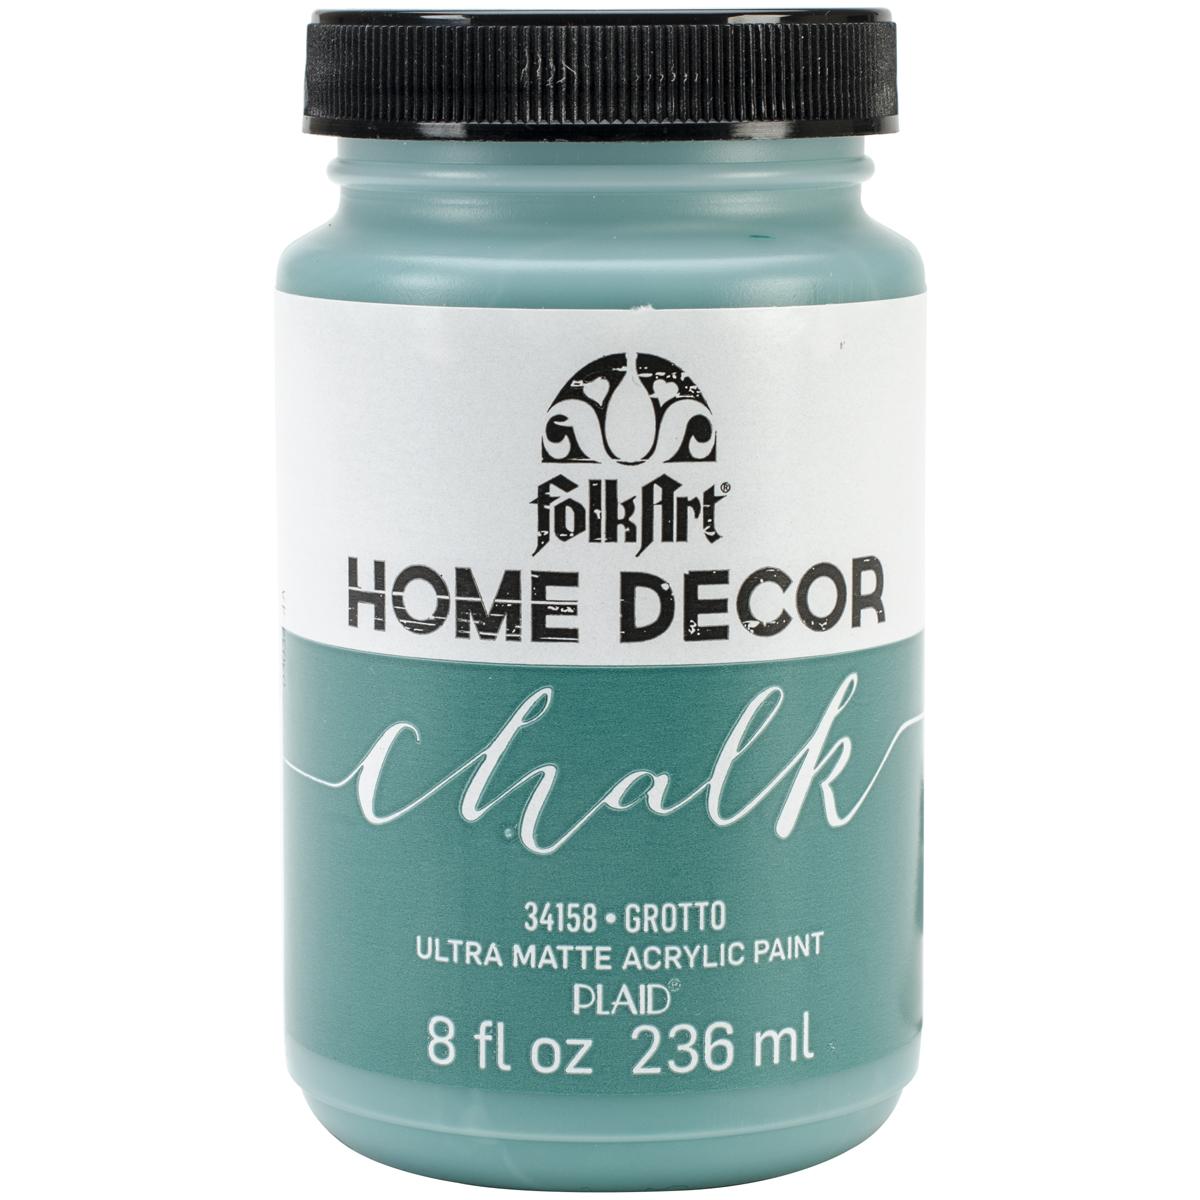 Folkart home decor chalk paint 8oz grotto ebay for Home decor chalk paint